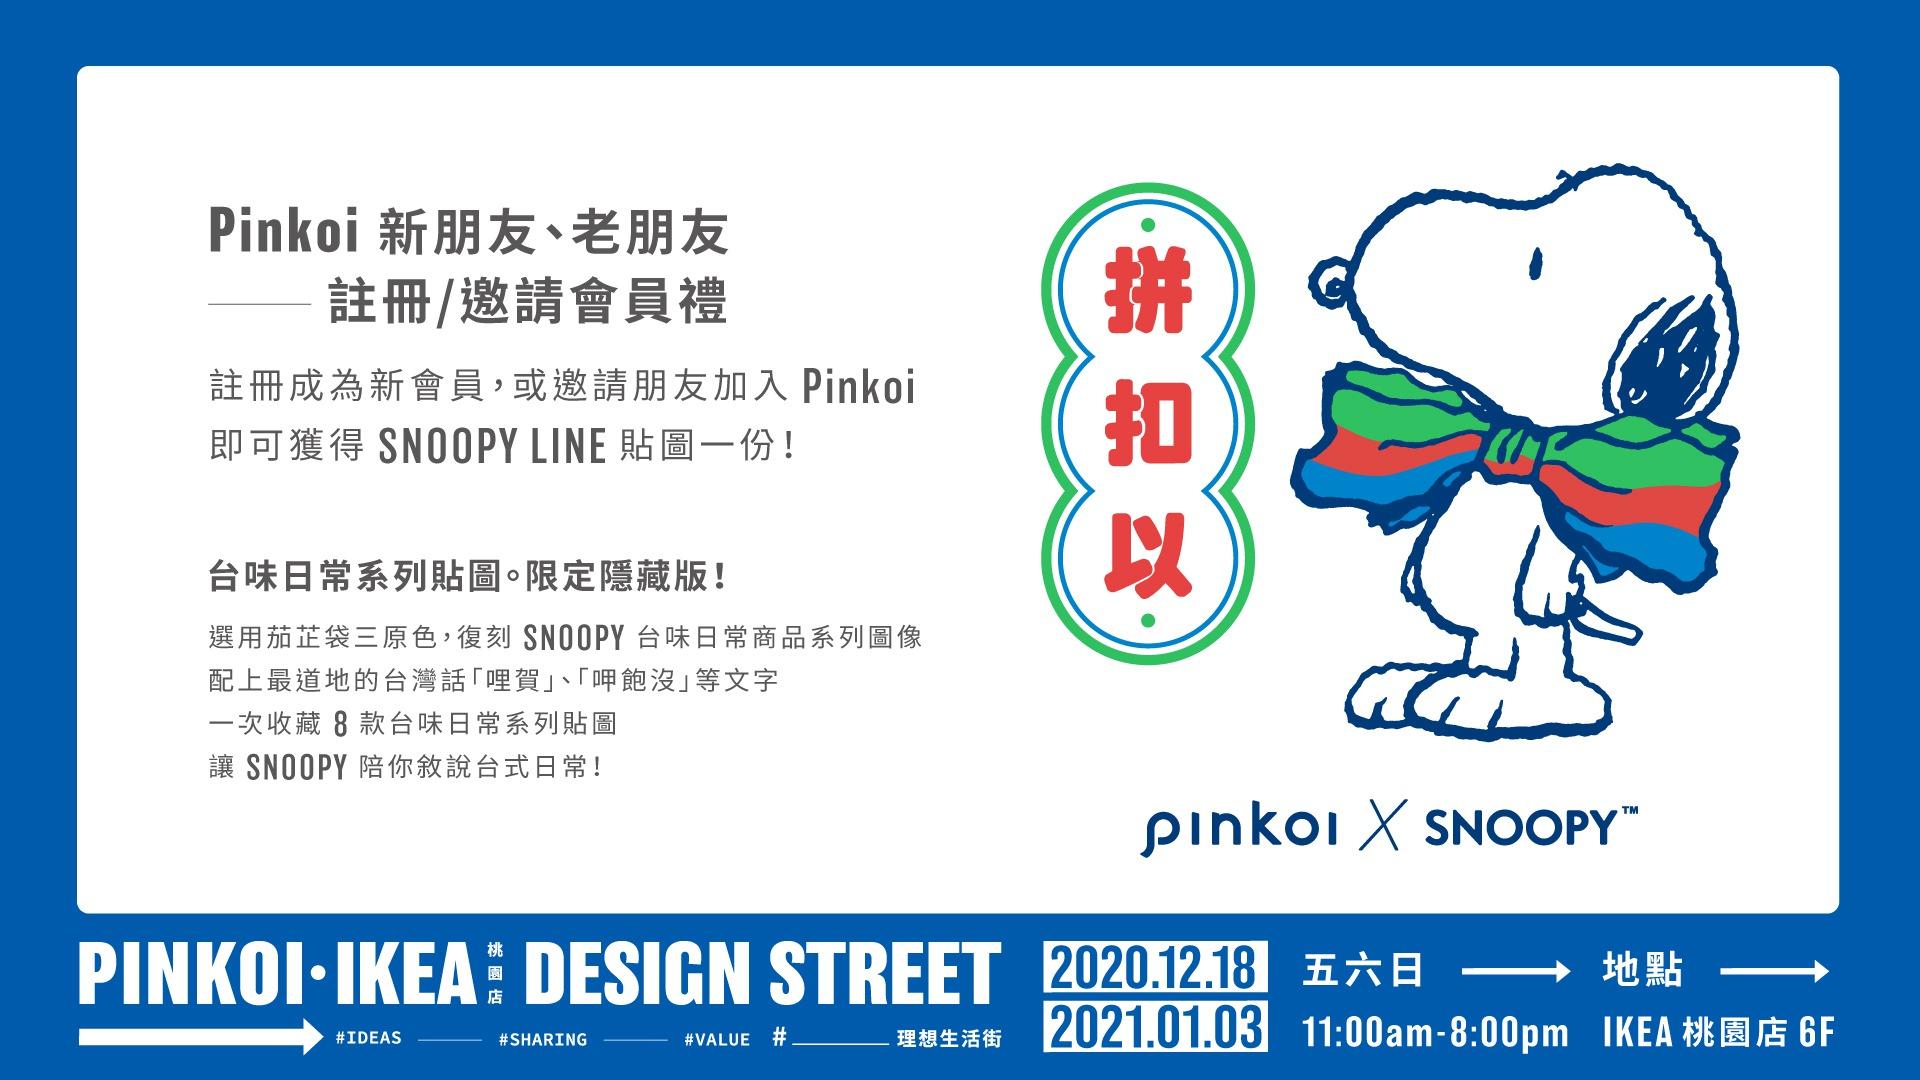 2020 pinkoi 市集 聖誕市集 品品市集